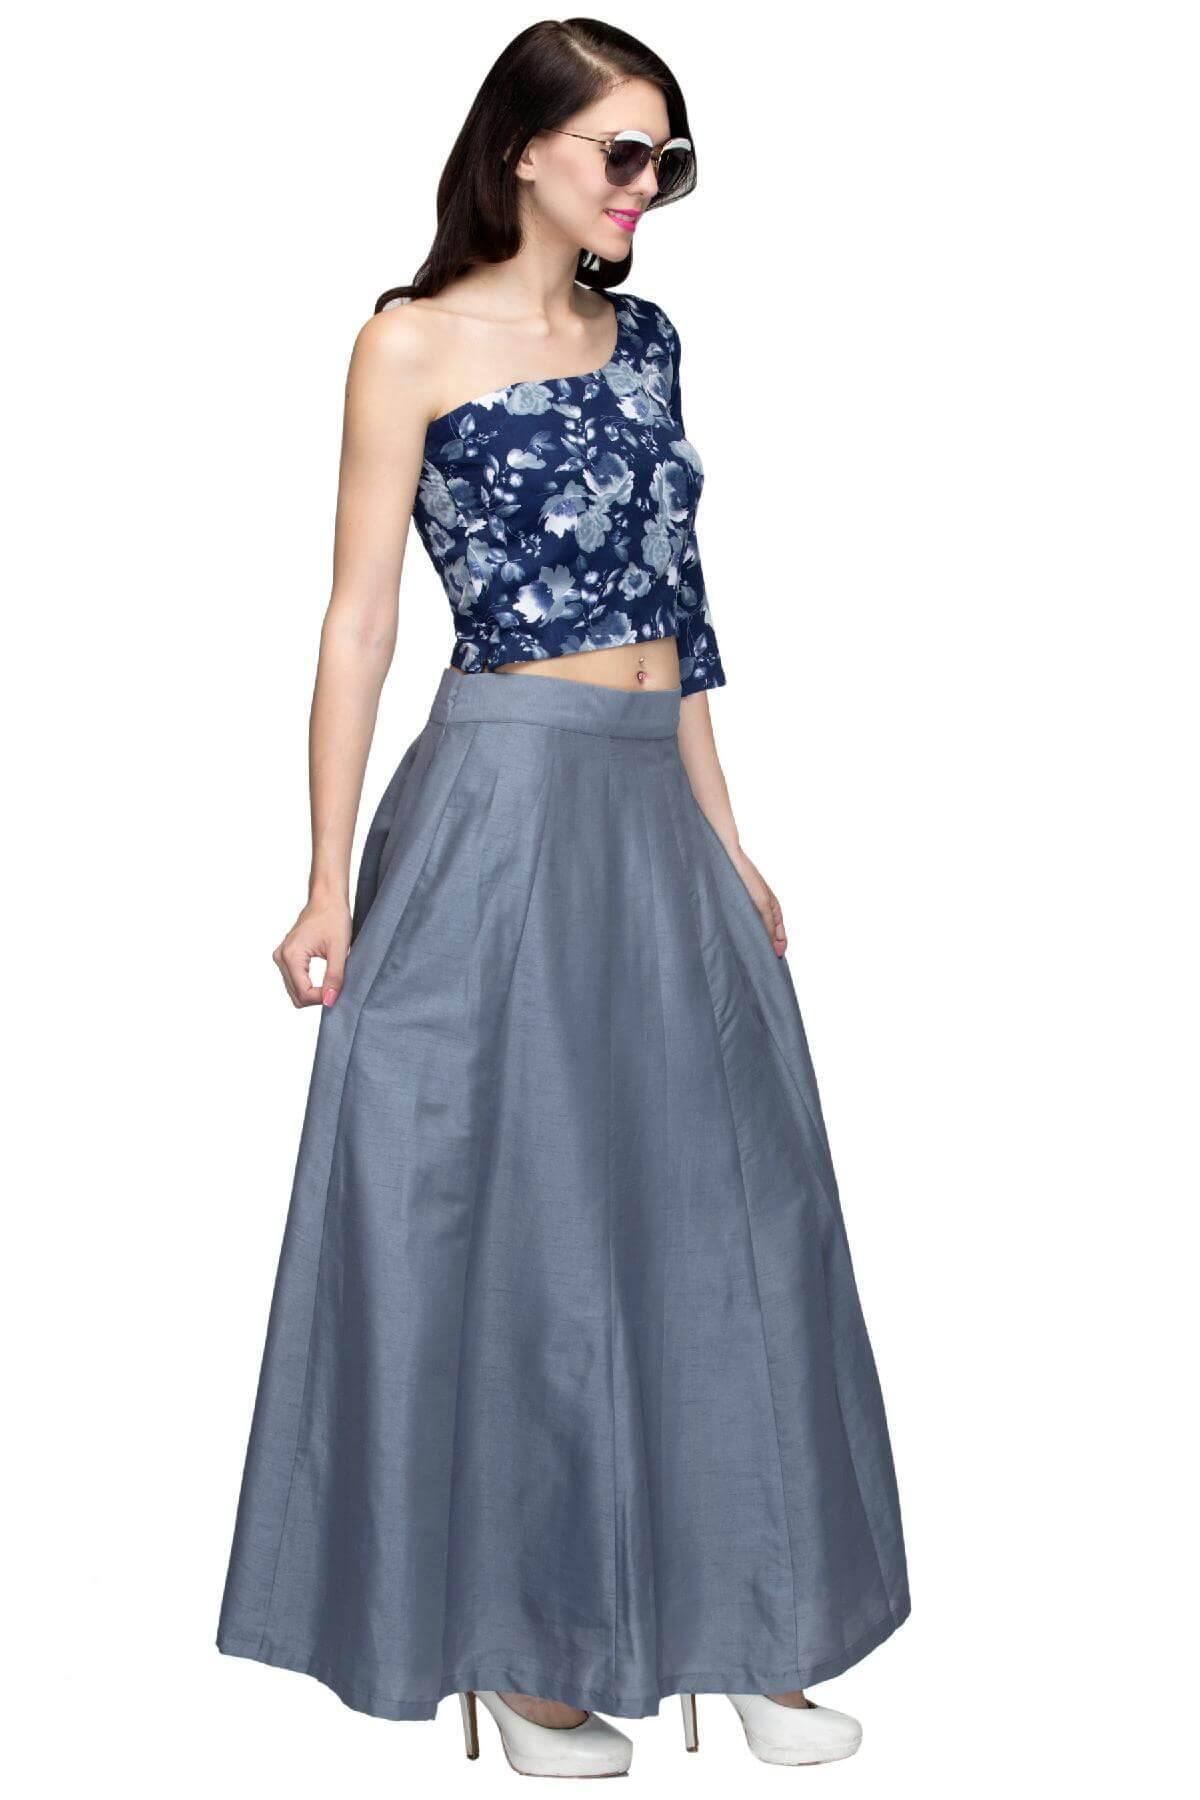 dp length amazon womens graceful at floors clothing dress s skirt maxi store chiffon skirts long women floor